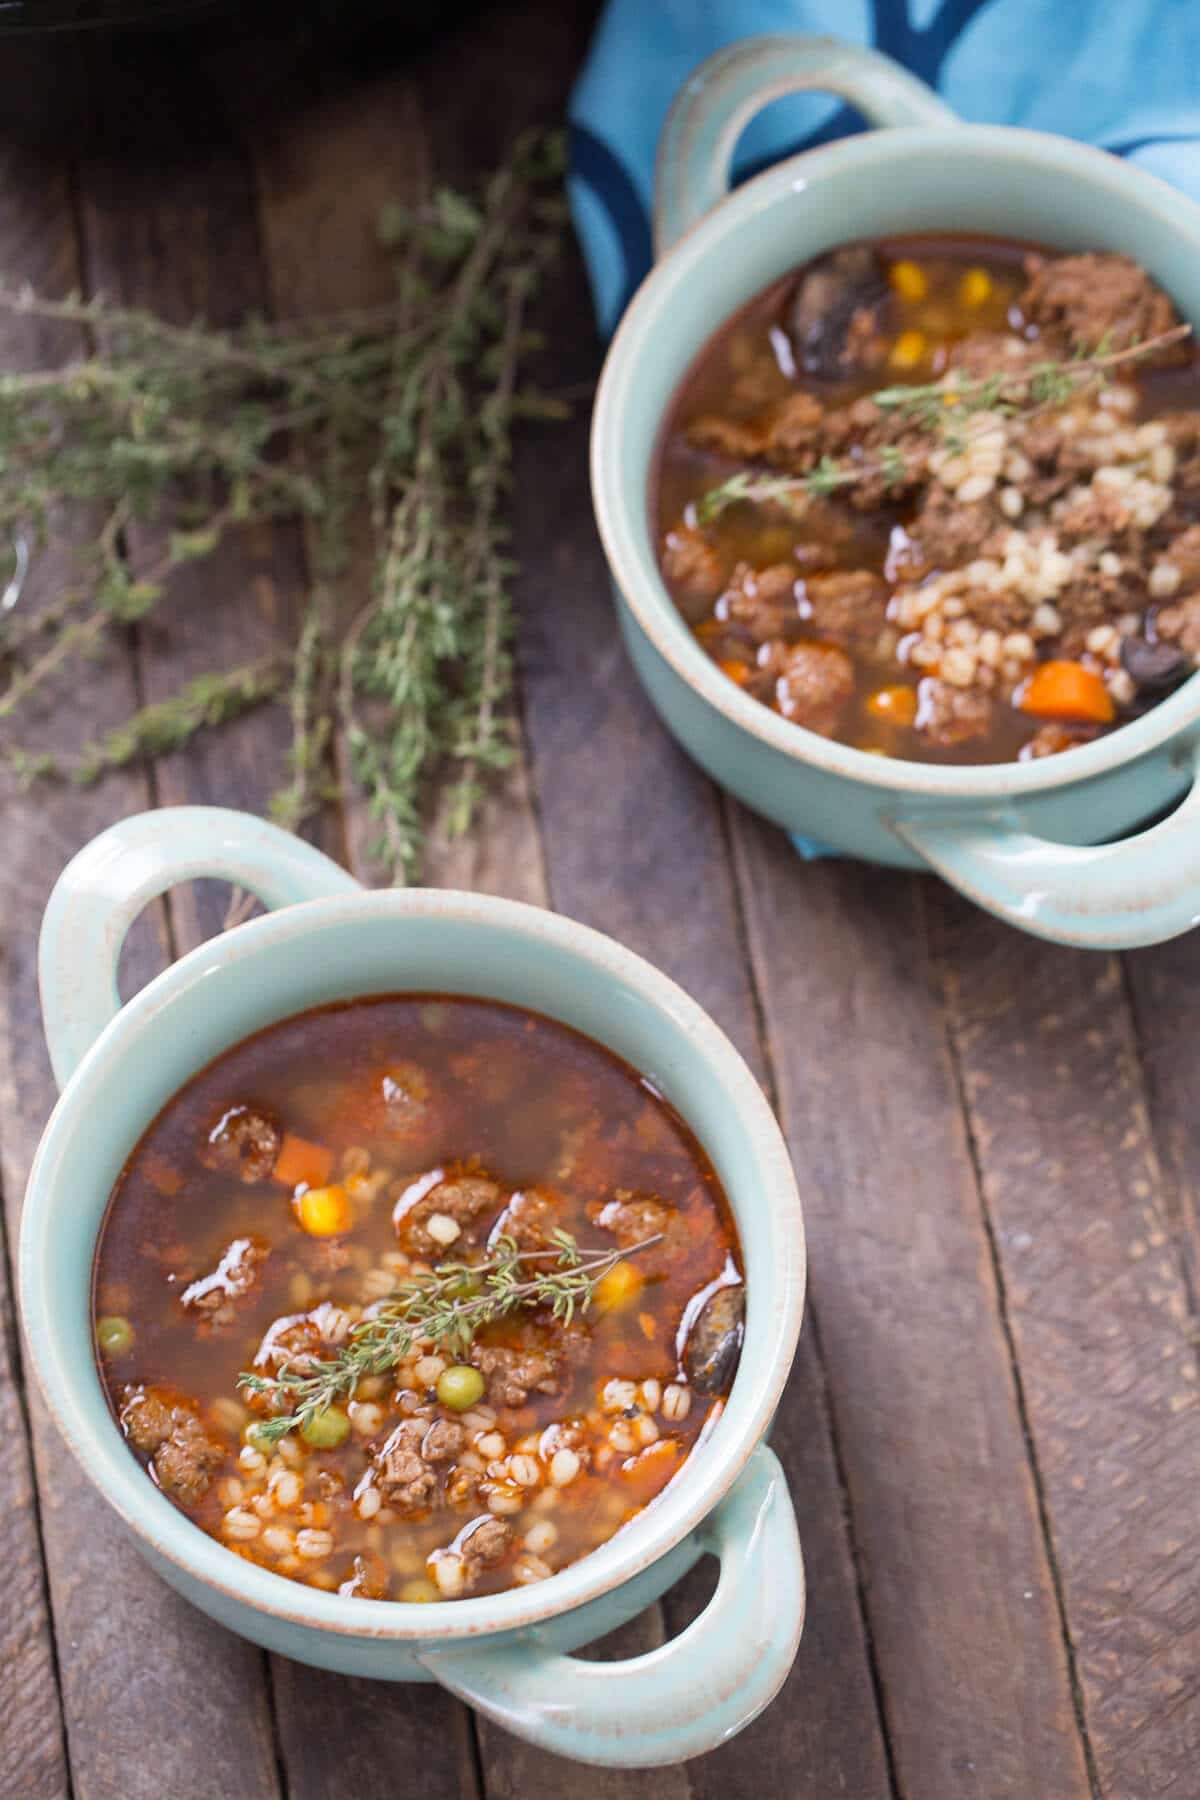 Slow Cooker Beef and Barley Soup Recipe - LemonsforLulu.com